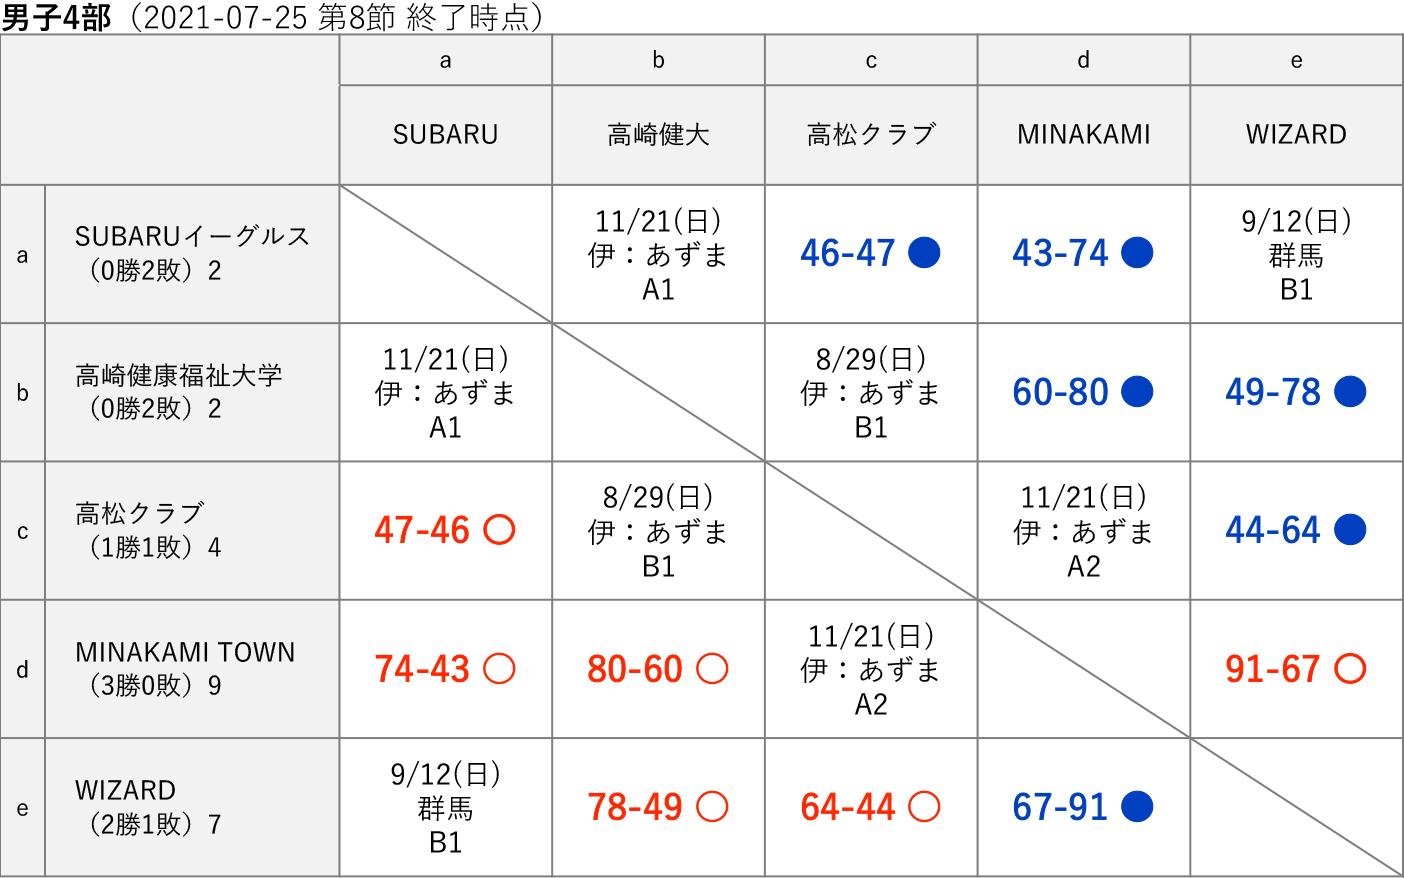 2021社会人リーグ 男子4部 星取り表(2021-07-25 第8節終了時)